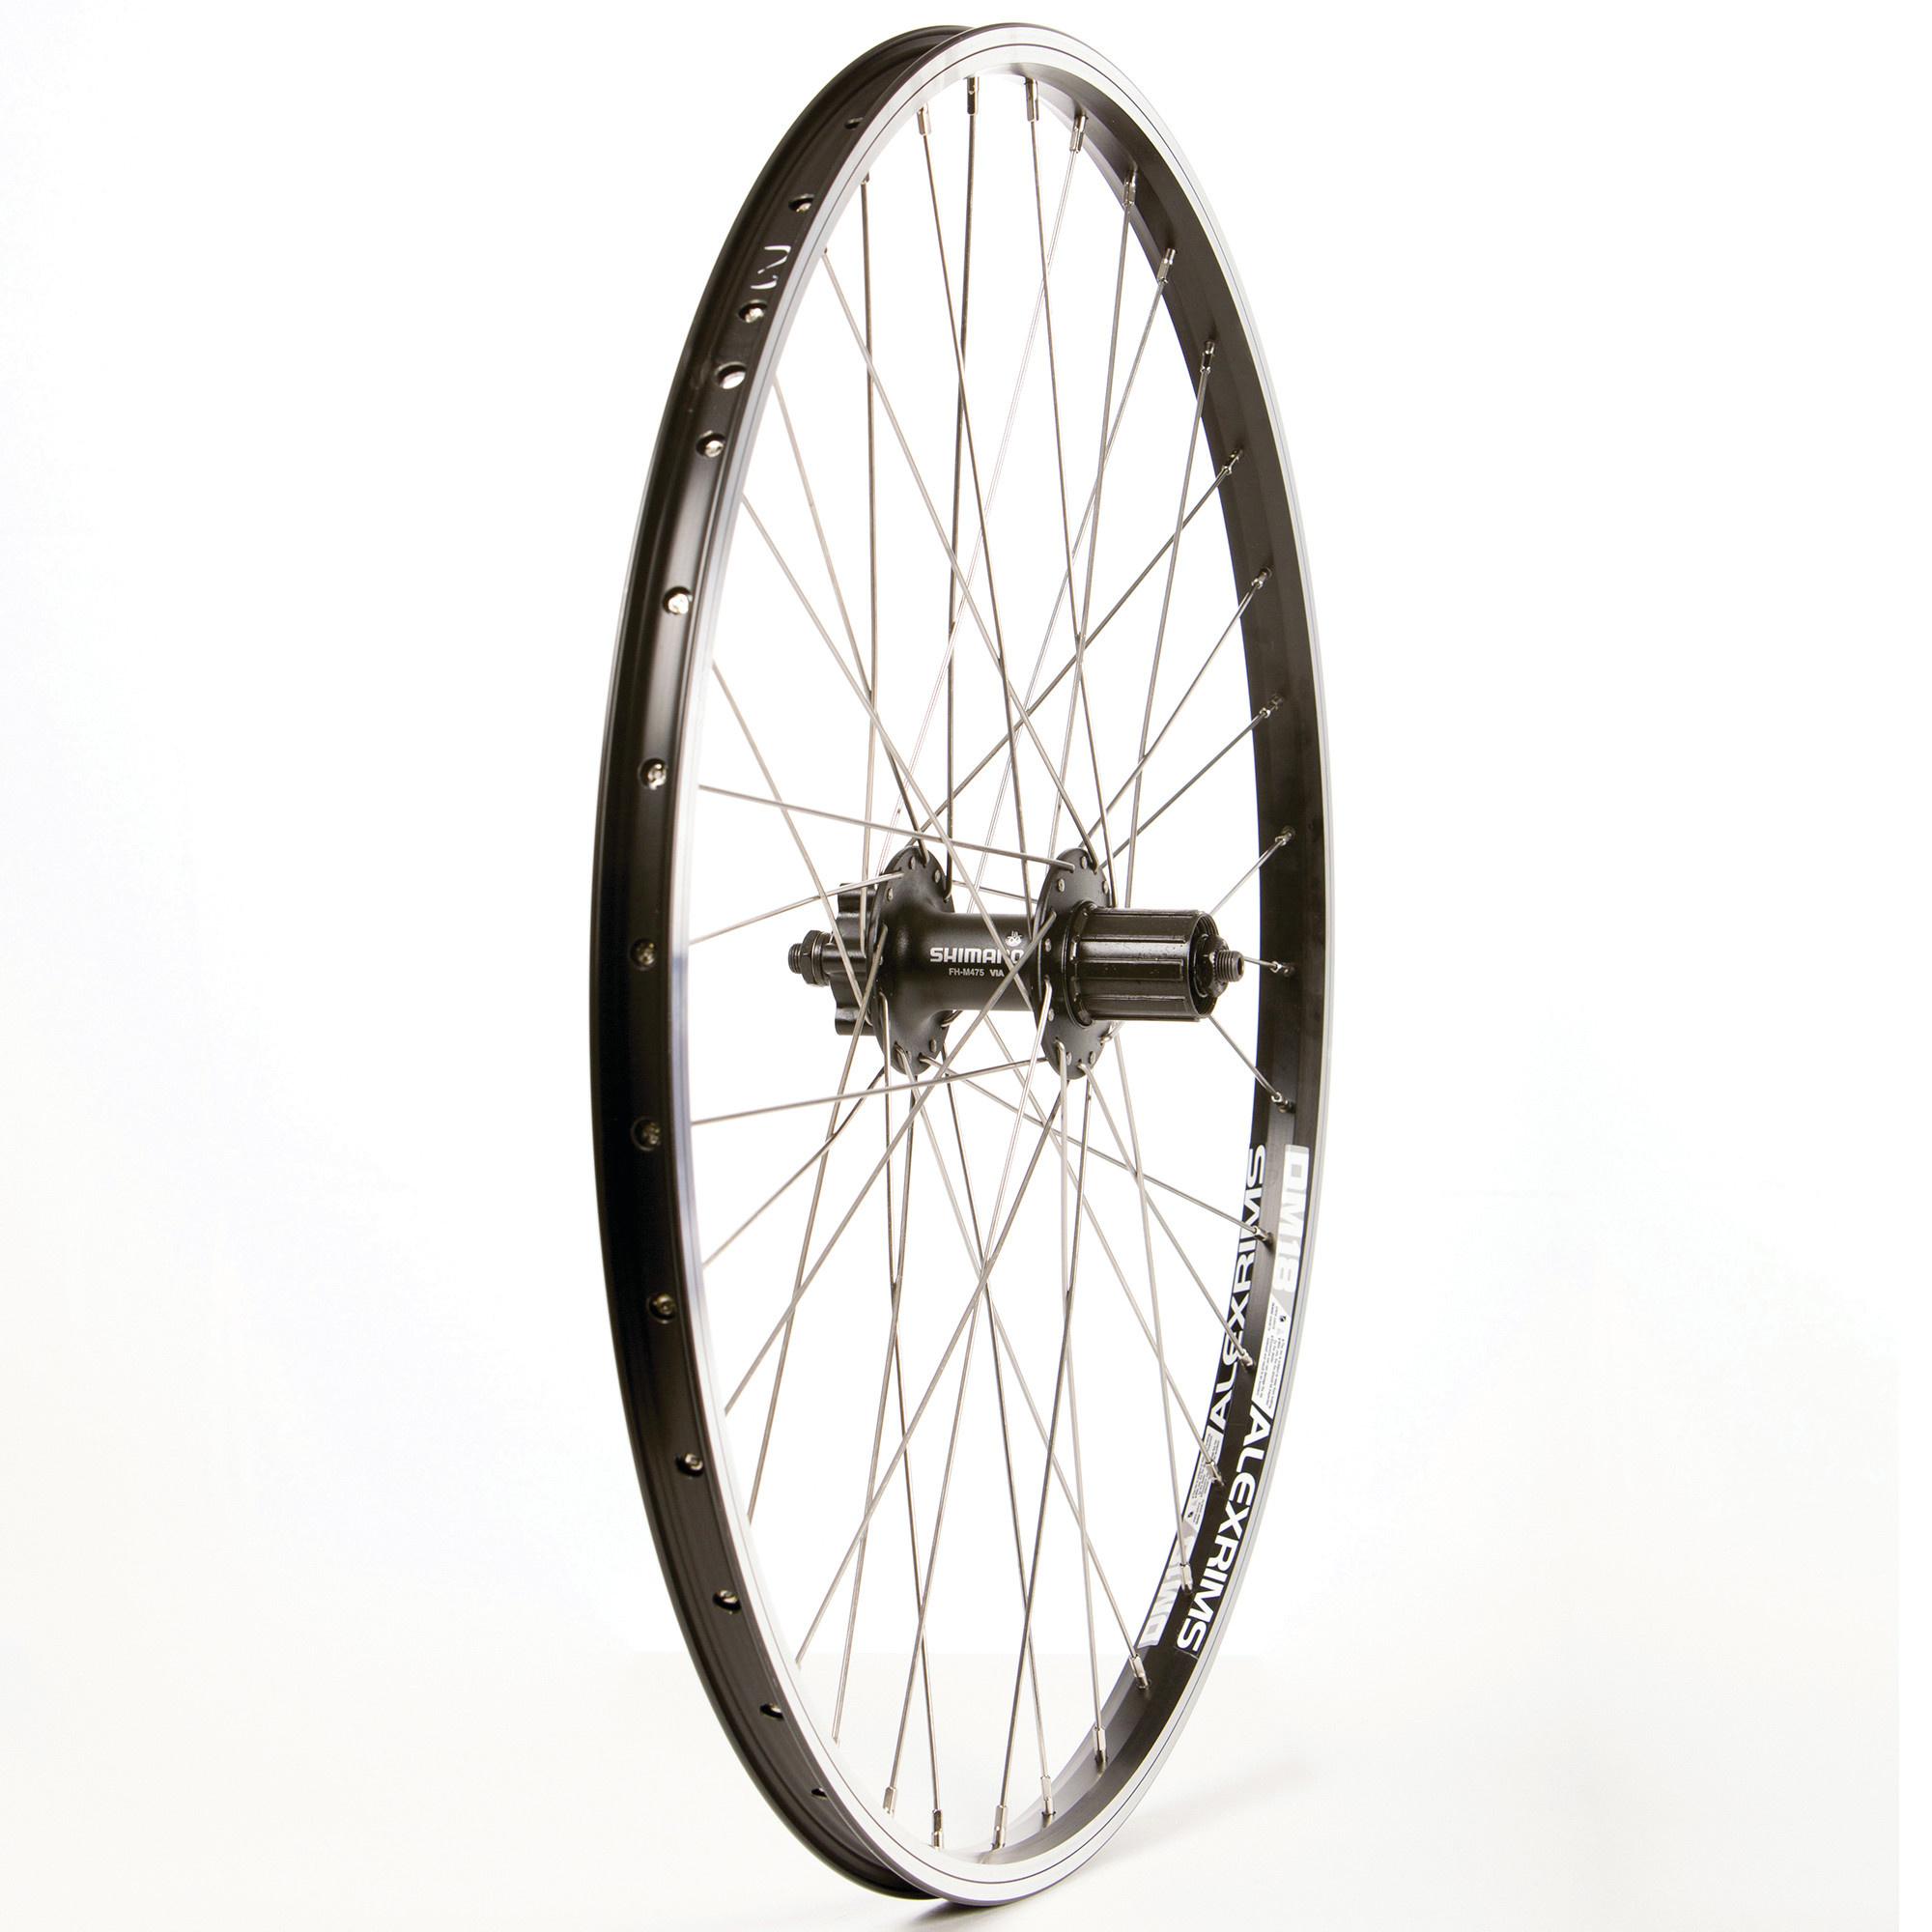 "WHEEL SHOP Wheel Shp, Rear 26"" Wheel, 36H Black Ally Duble Wall Alex DM-18/ Black Shiman FH-M475 QR 8-10spd 6 Blt Disc Hub, Stainless Spkes"